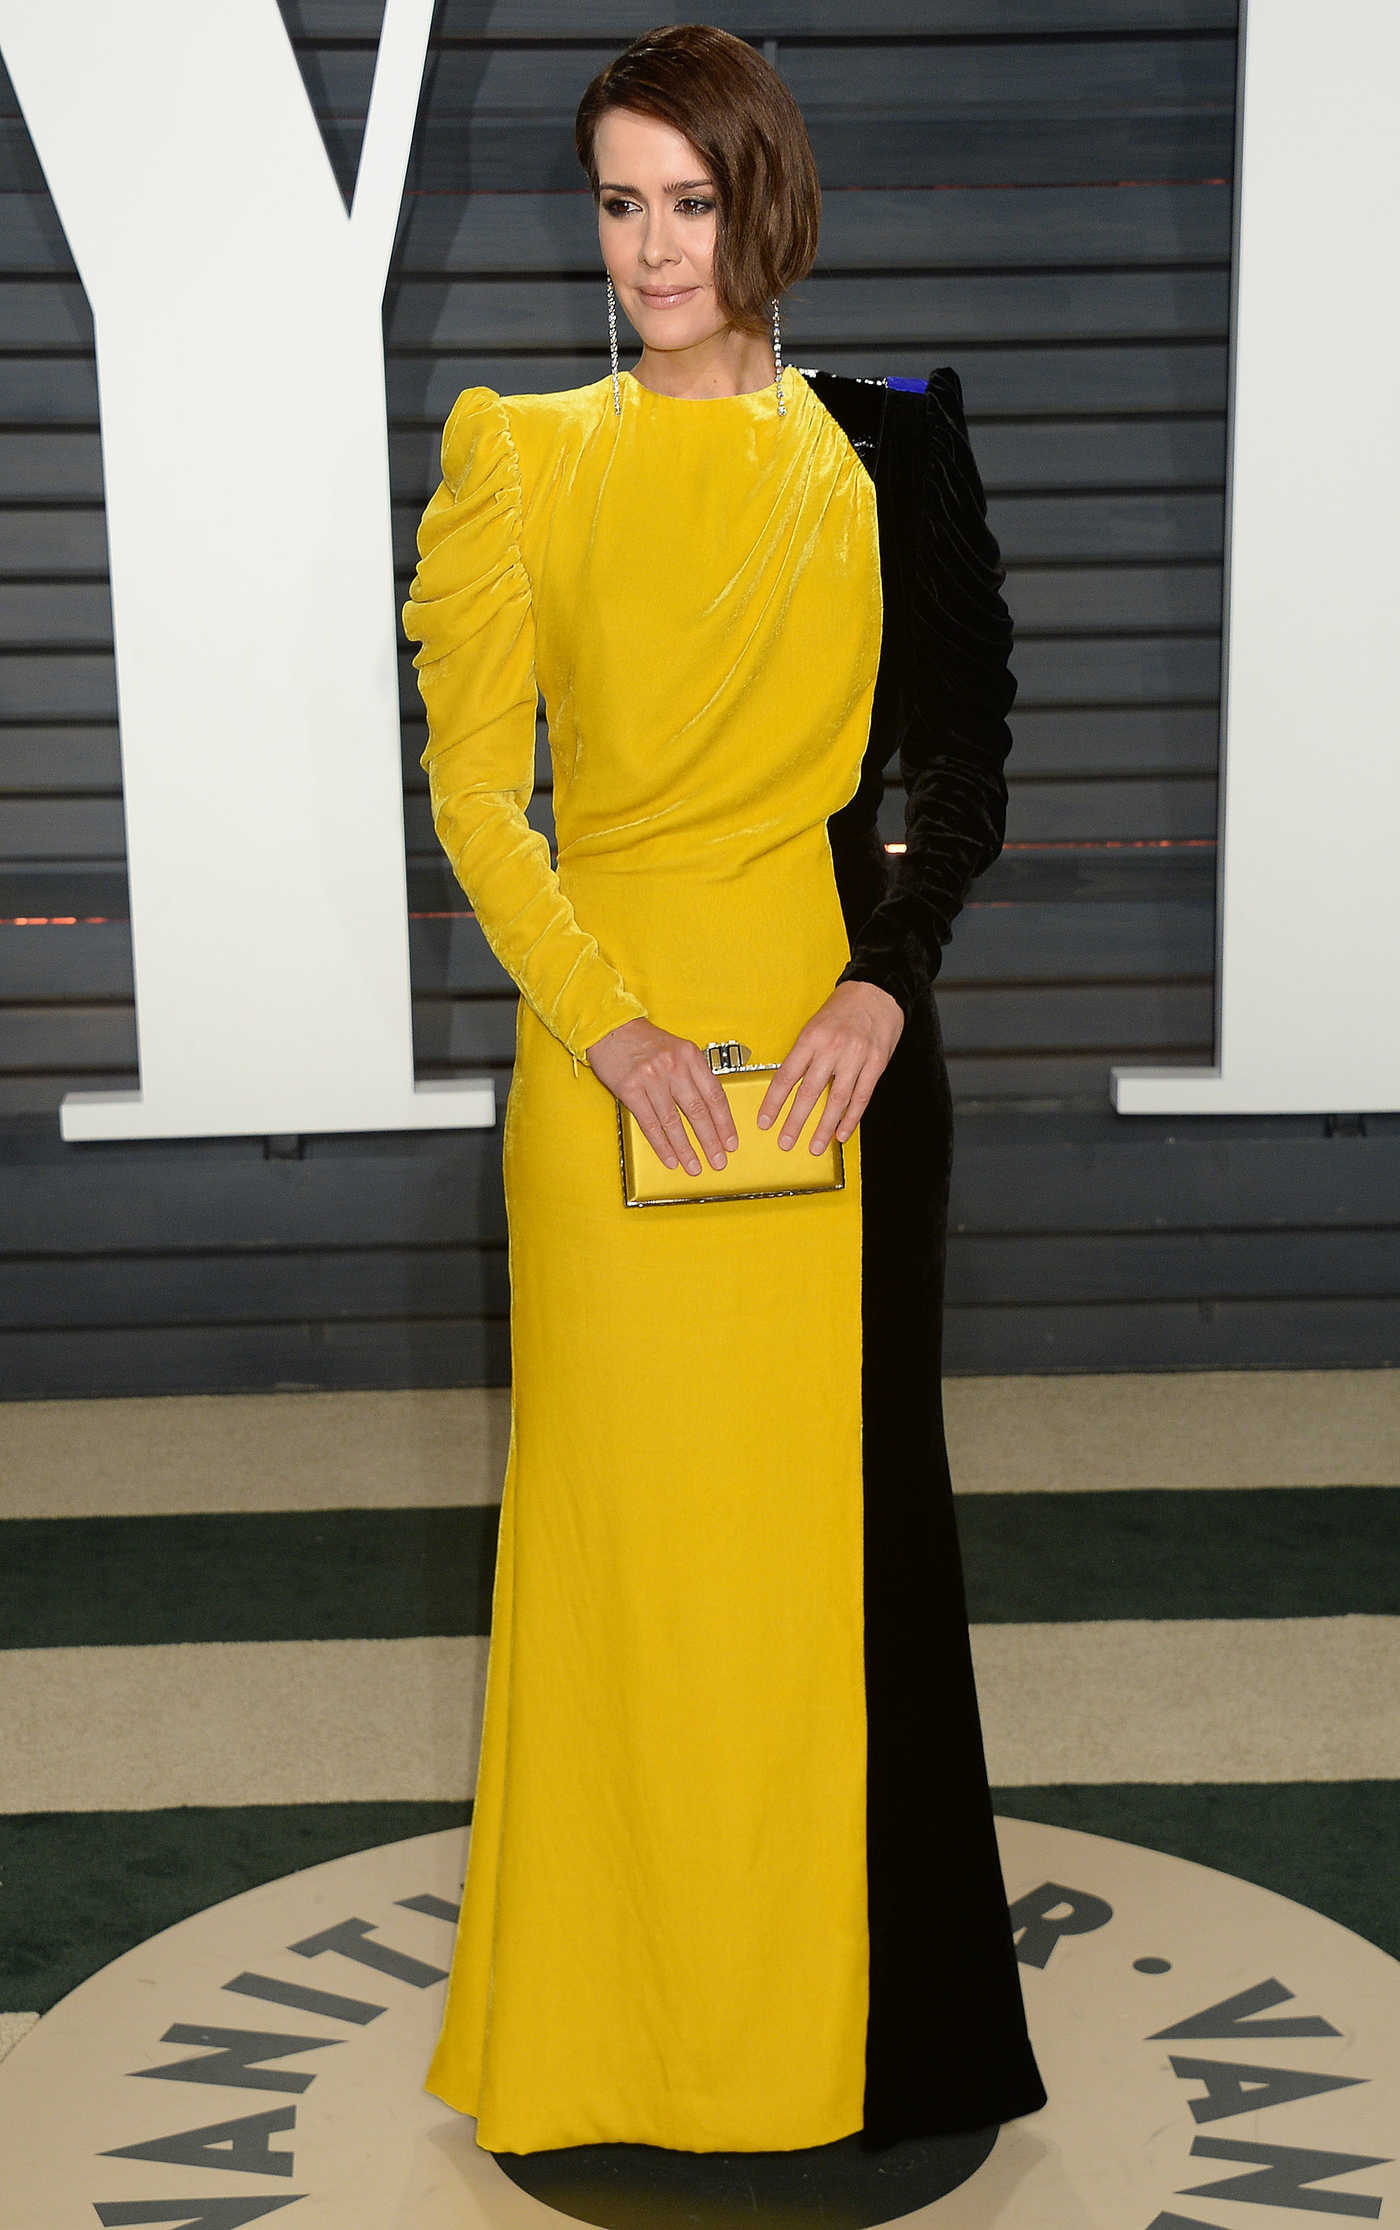 Sarah Paulson at the 2017 Vanity Fair Oscar Party in Beverly Hills 02/26/2017